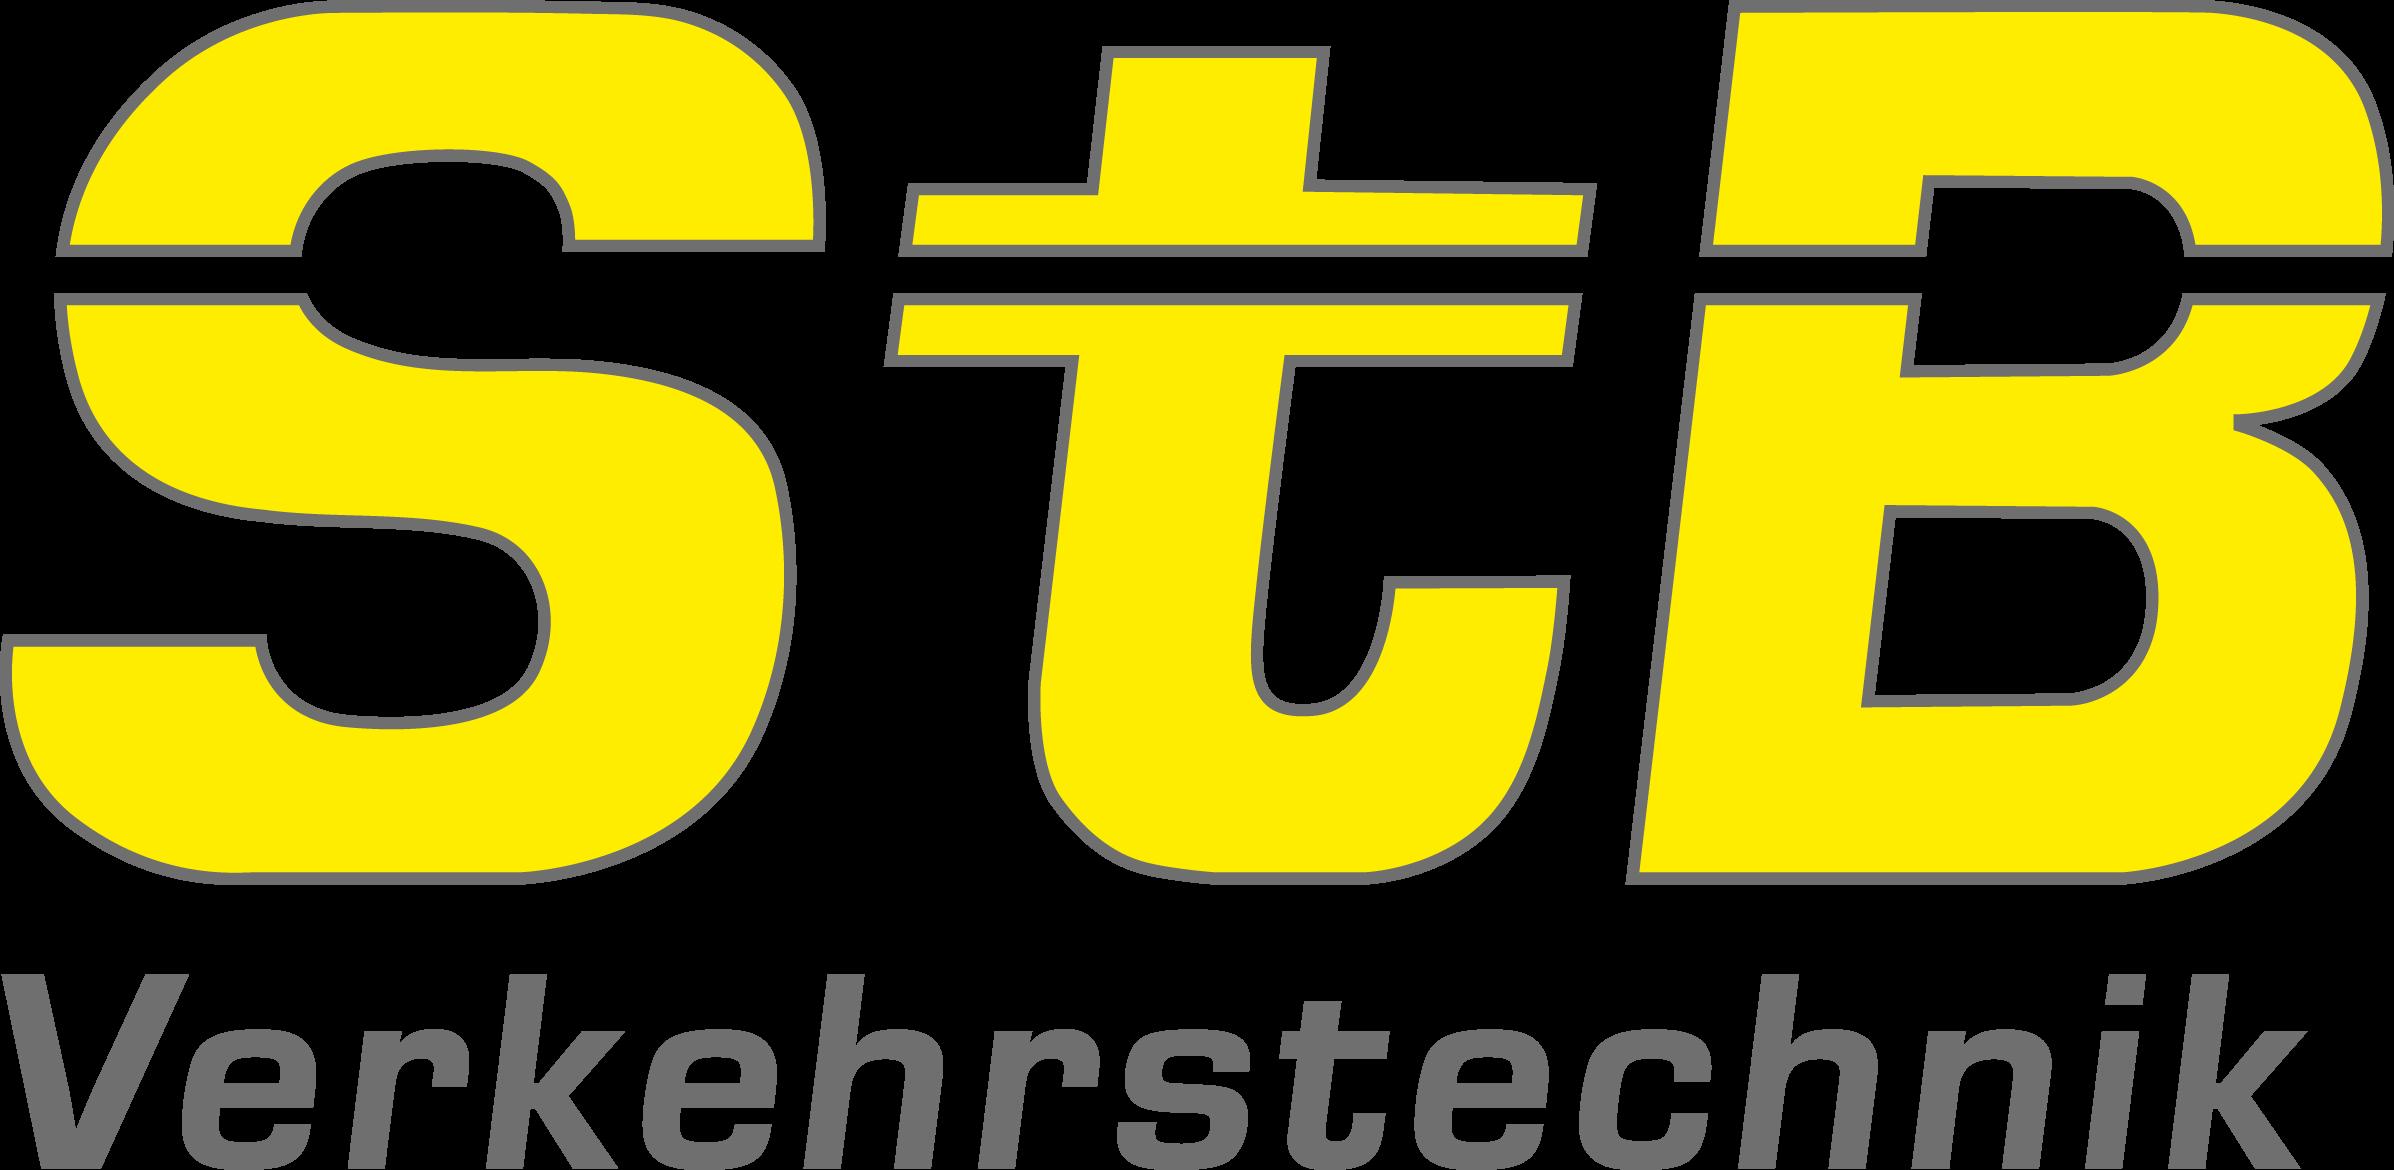 StB Verkehrstechnik